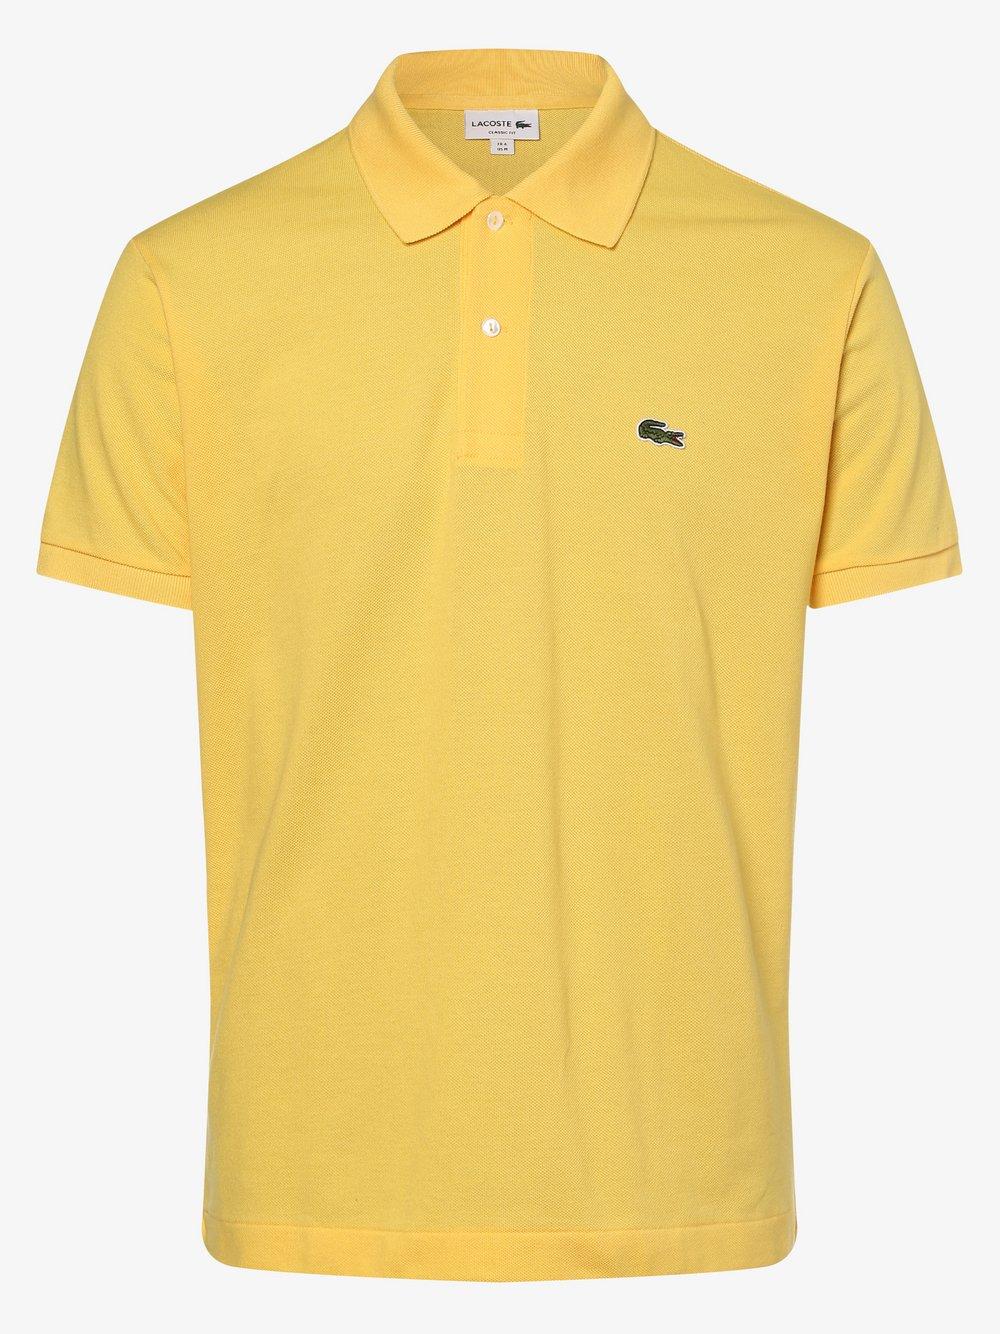 Lacoste - Męska koszulka polo, żółty